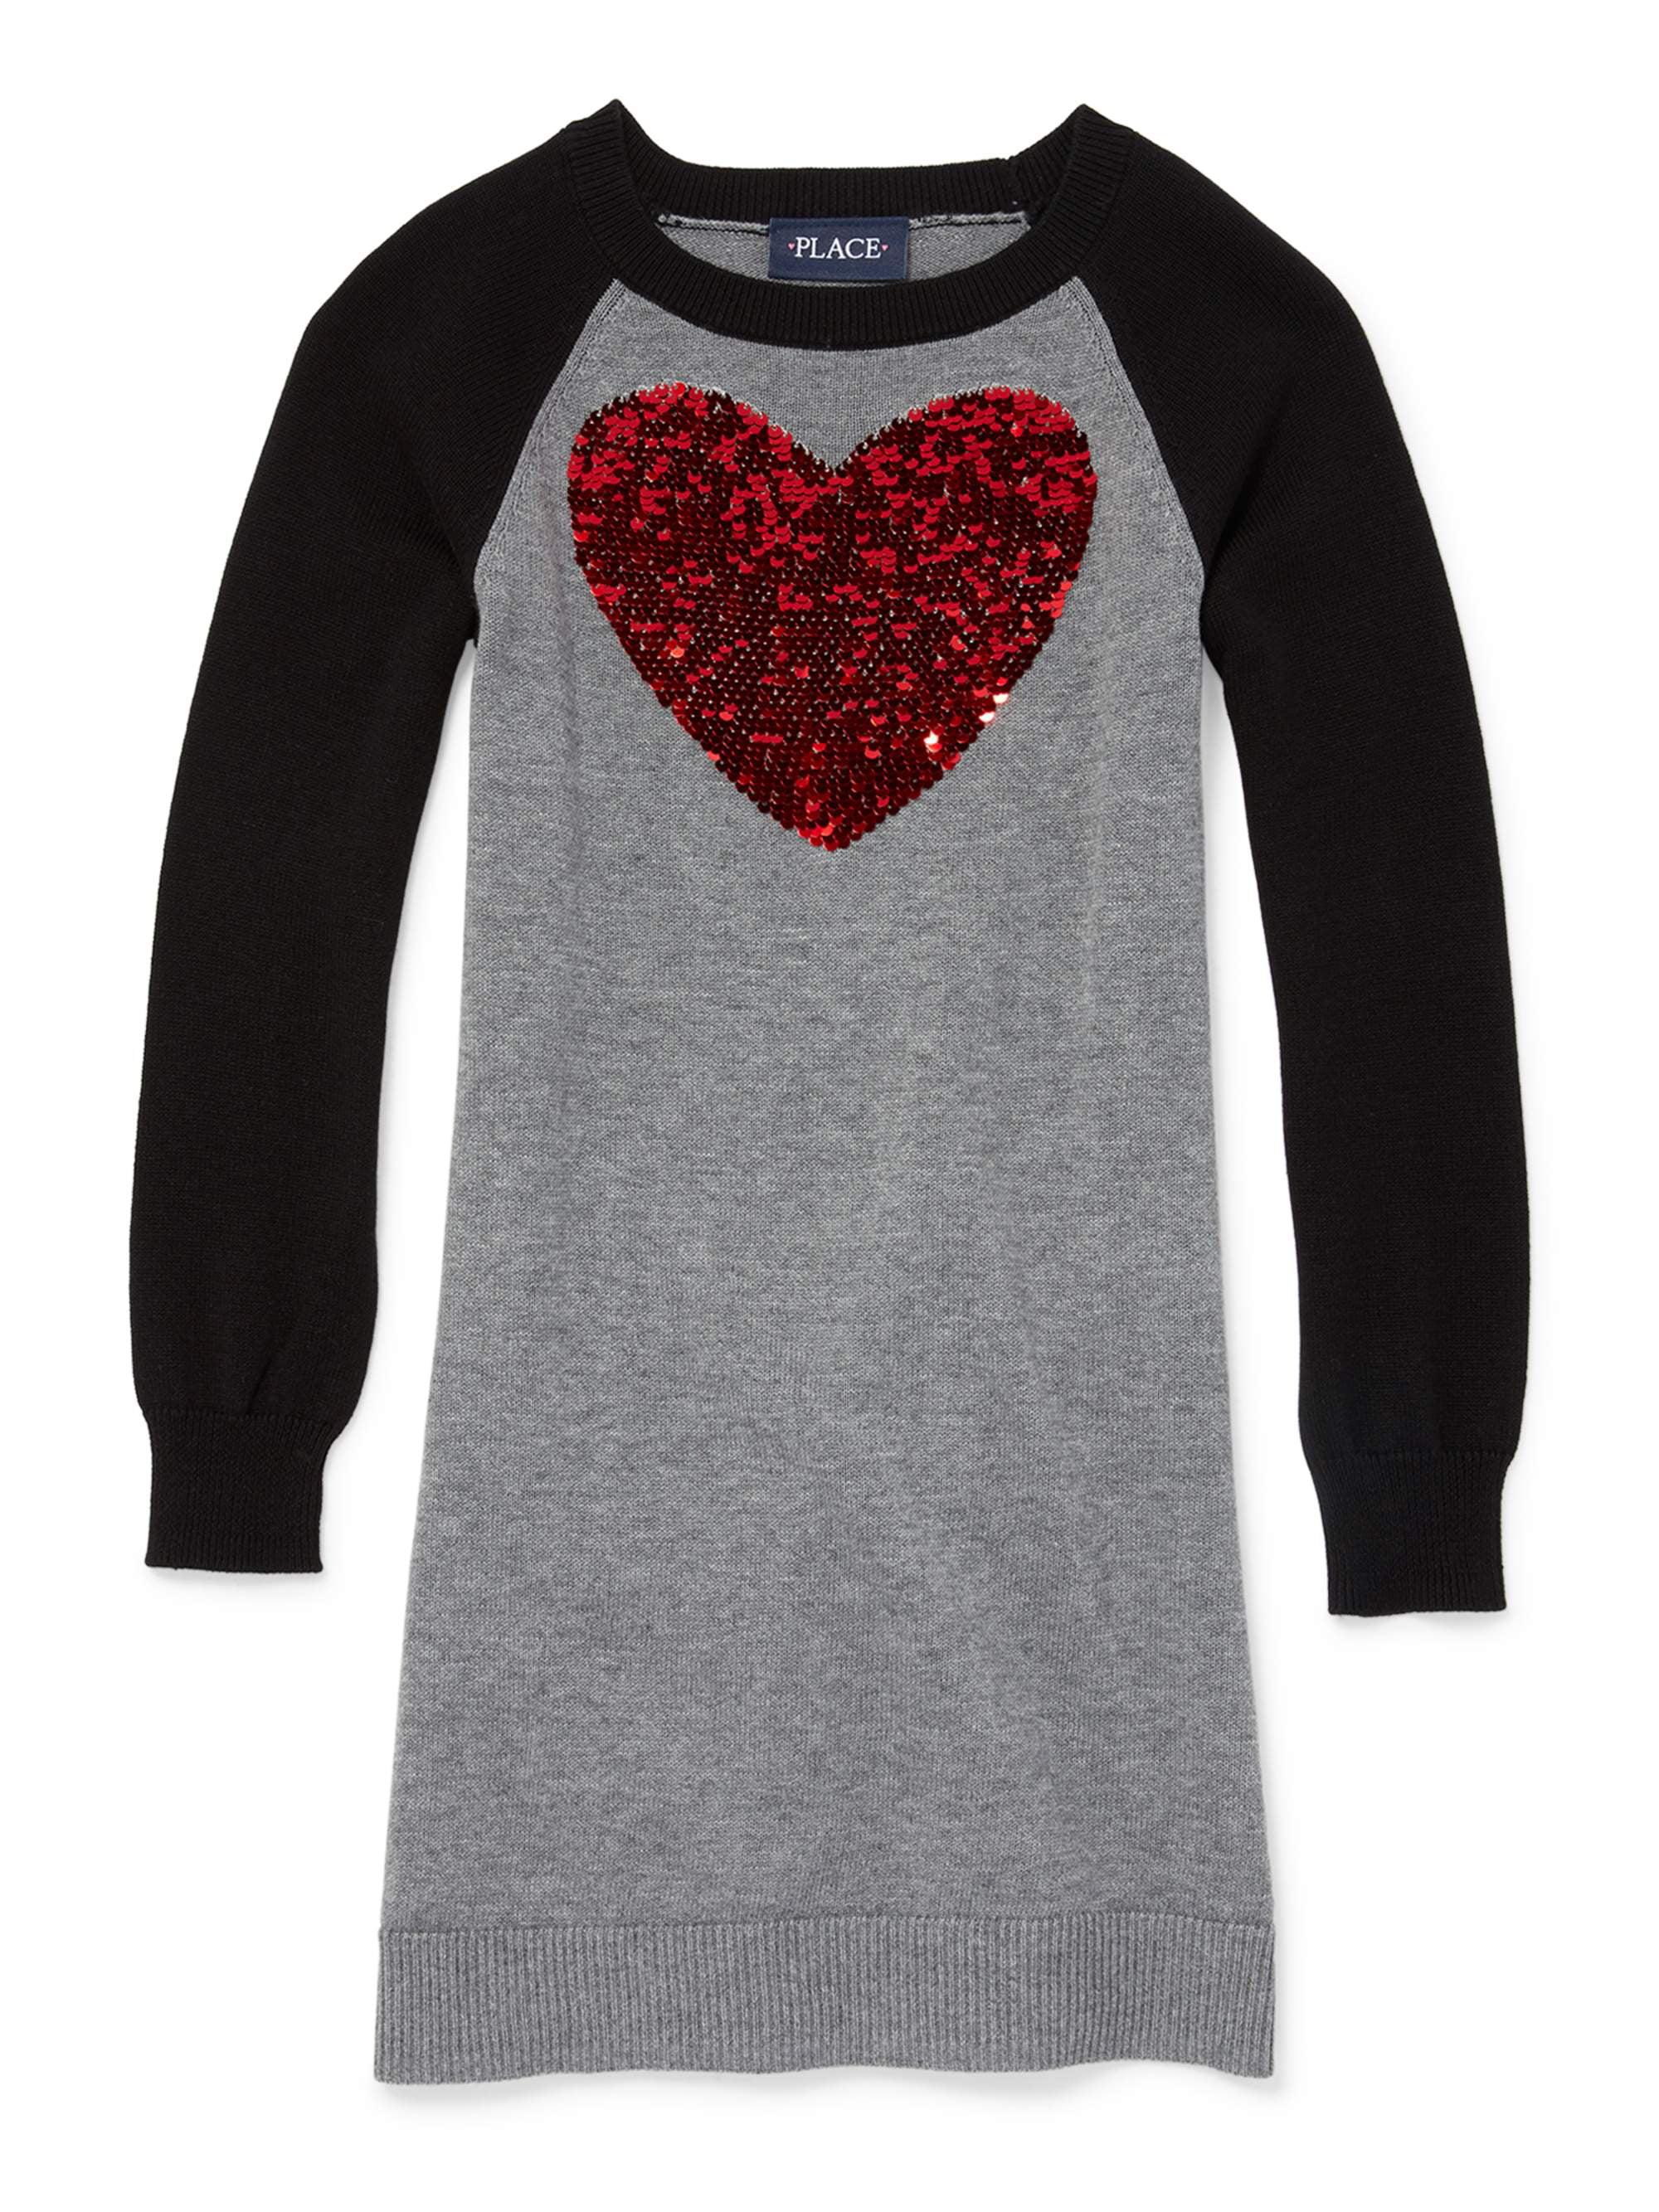 Valentine's Day Heart Sweater Dress (Little Girls & Big Girls)